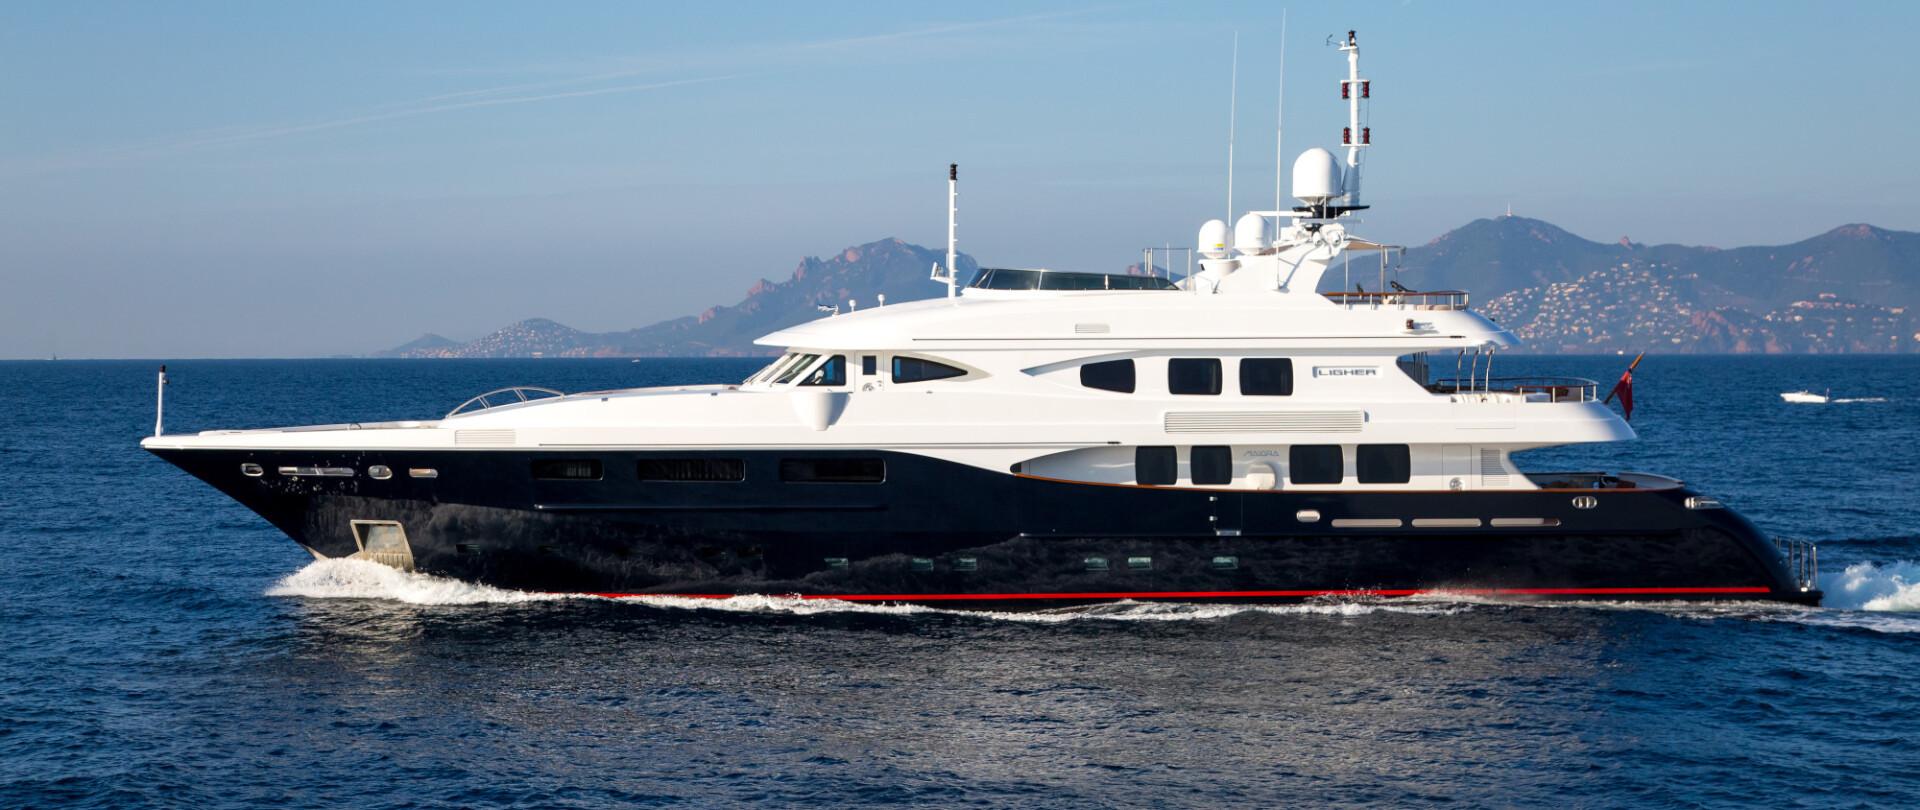 Yacht sold, Lighea photo 2